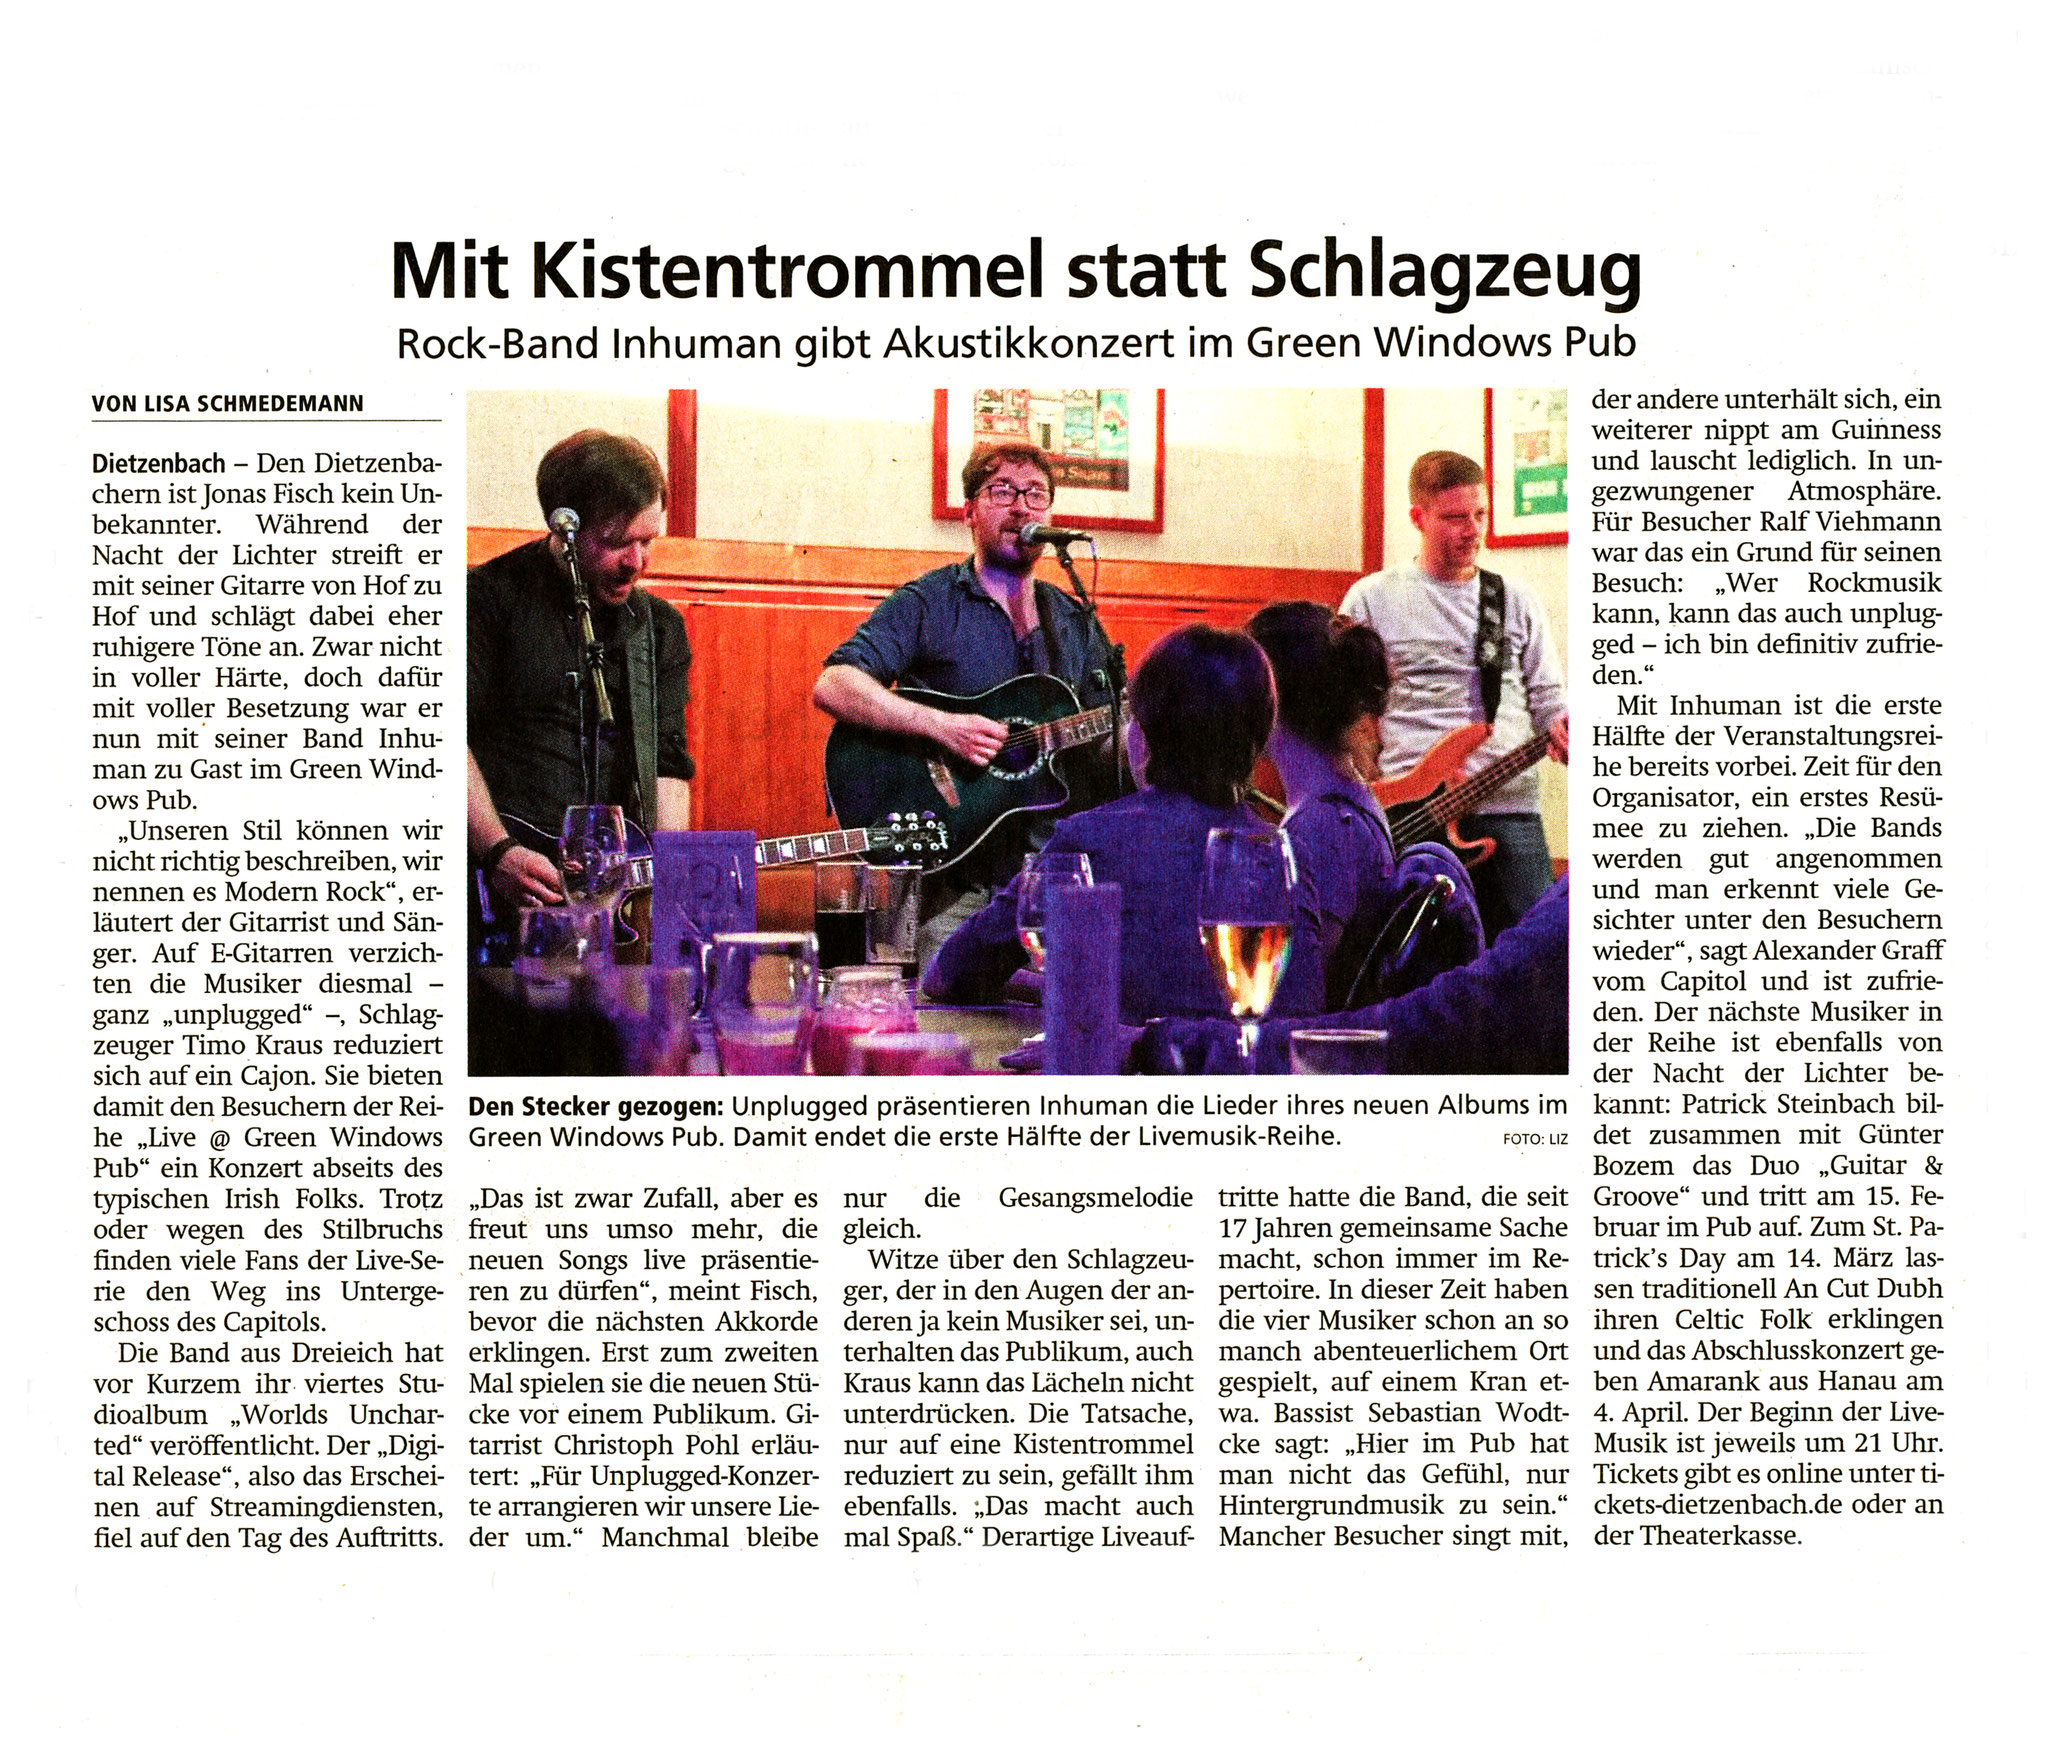 Offenbach Post, 24. Januar 2020